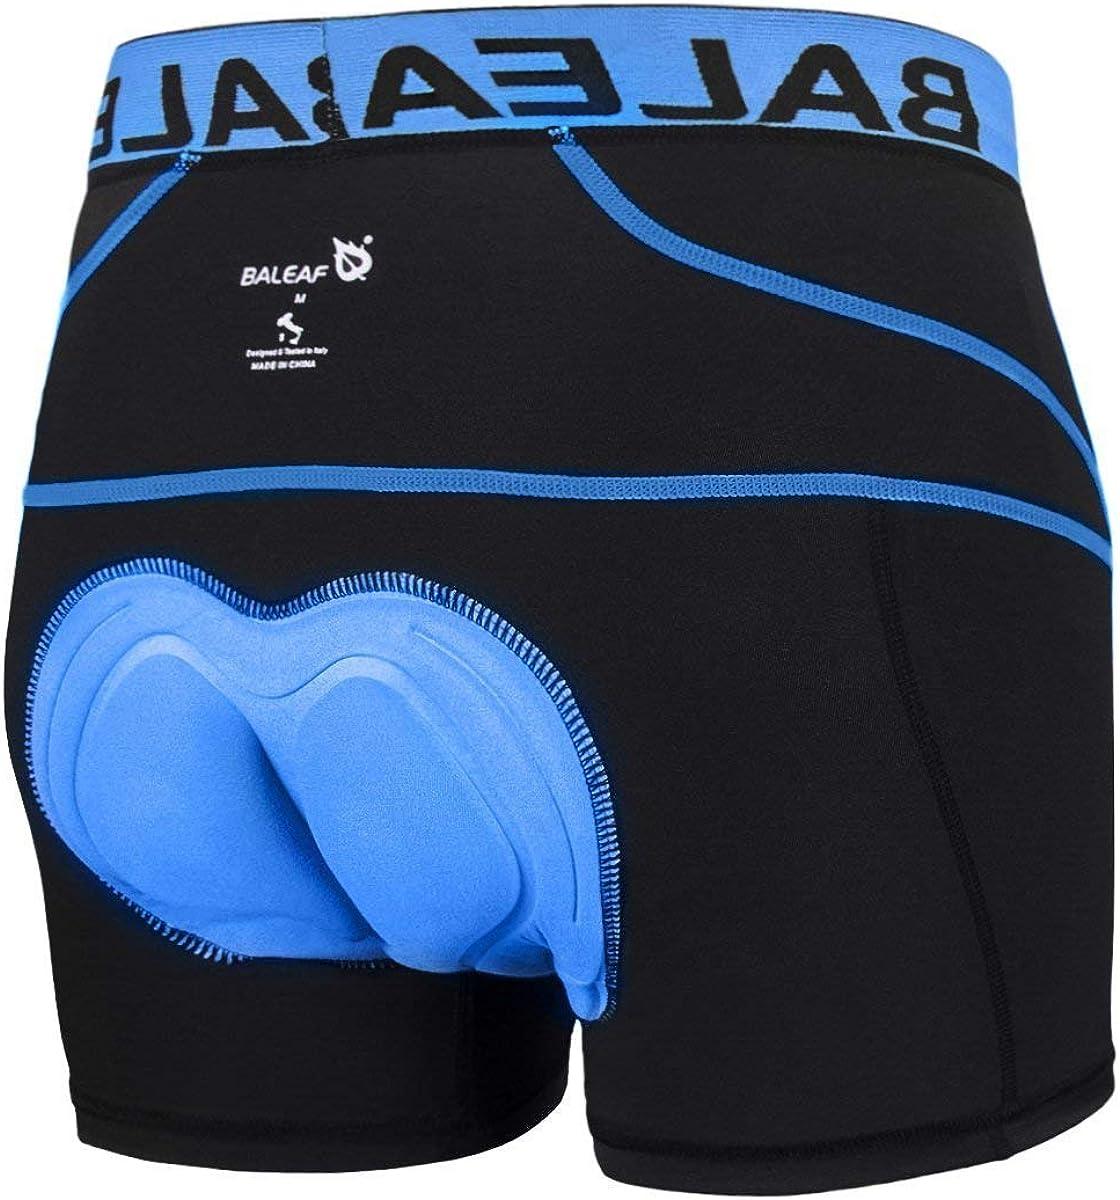 Mens Cycling Underwear 3D Padded Bike Riding Shorts Pants Shorts M-XXL Seller #